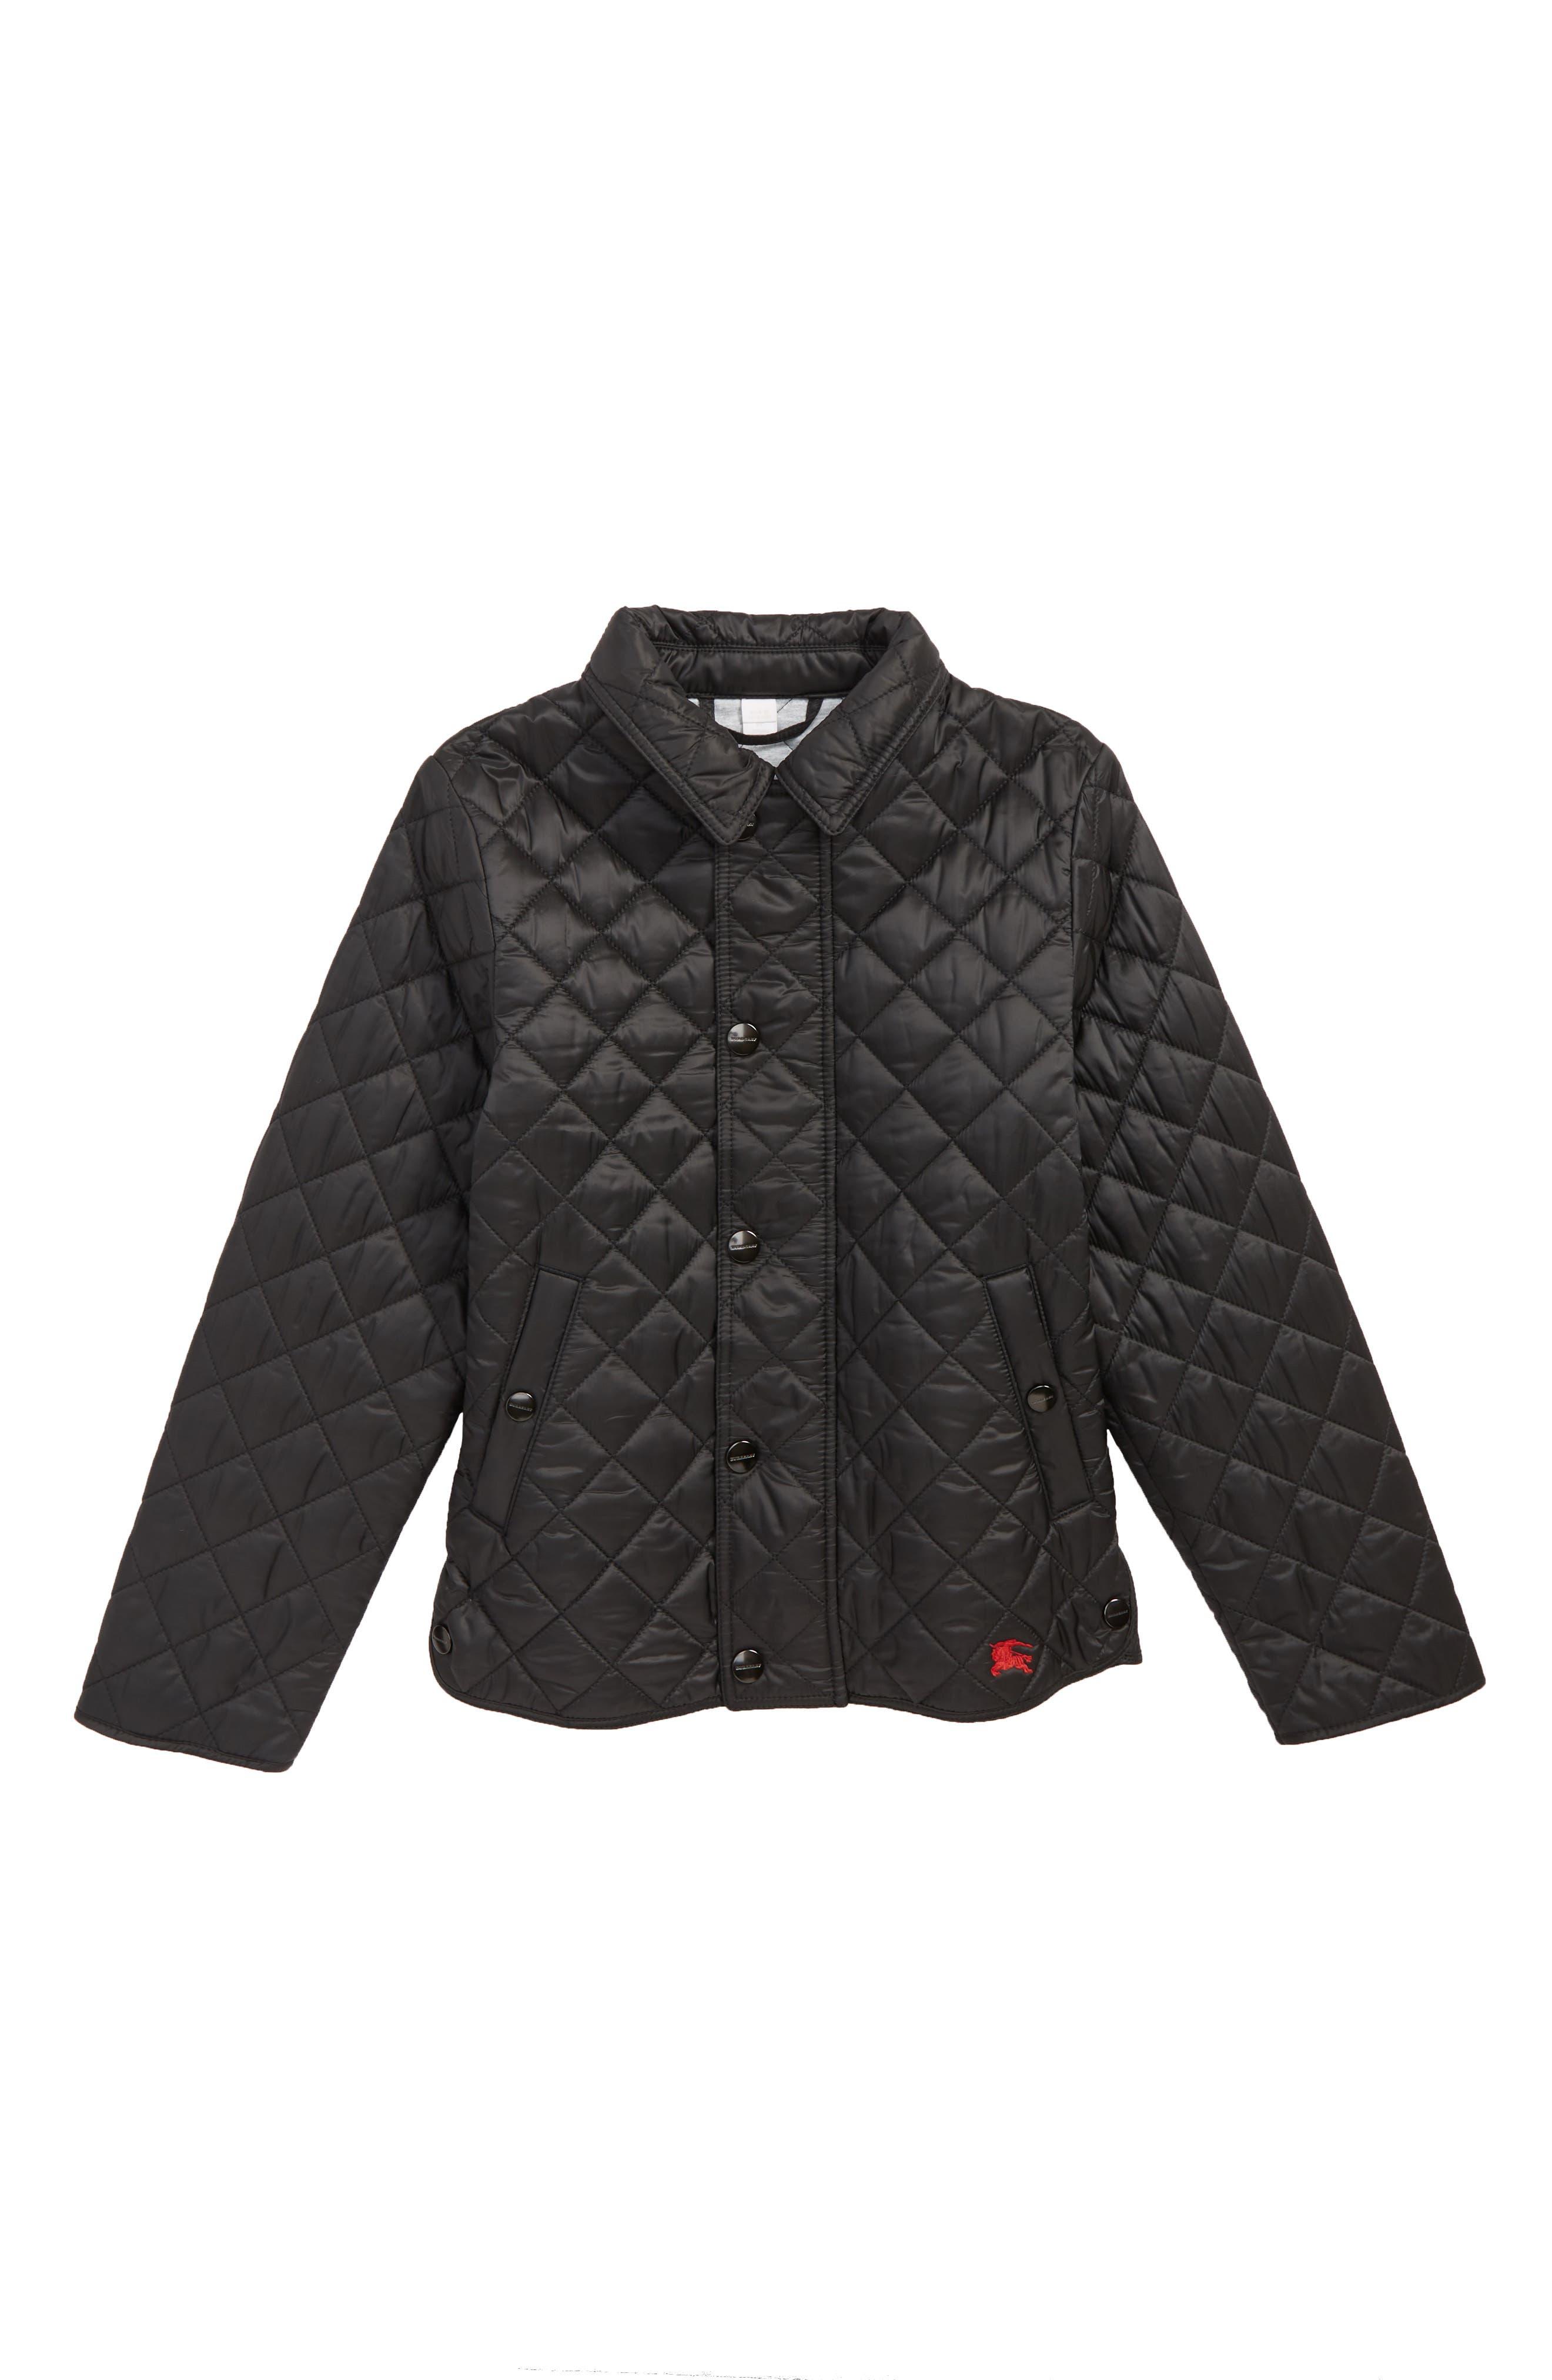 Lyle Diamond Quilted Jacket,                             Main thumbnail 1, color,                             BLACK